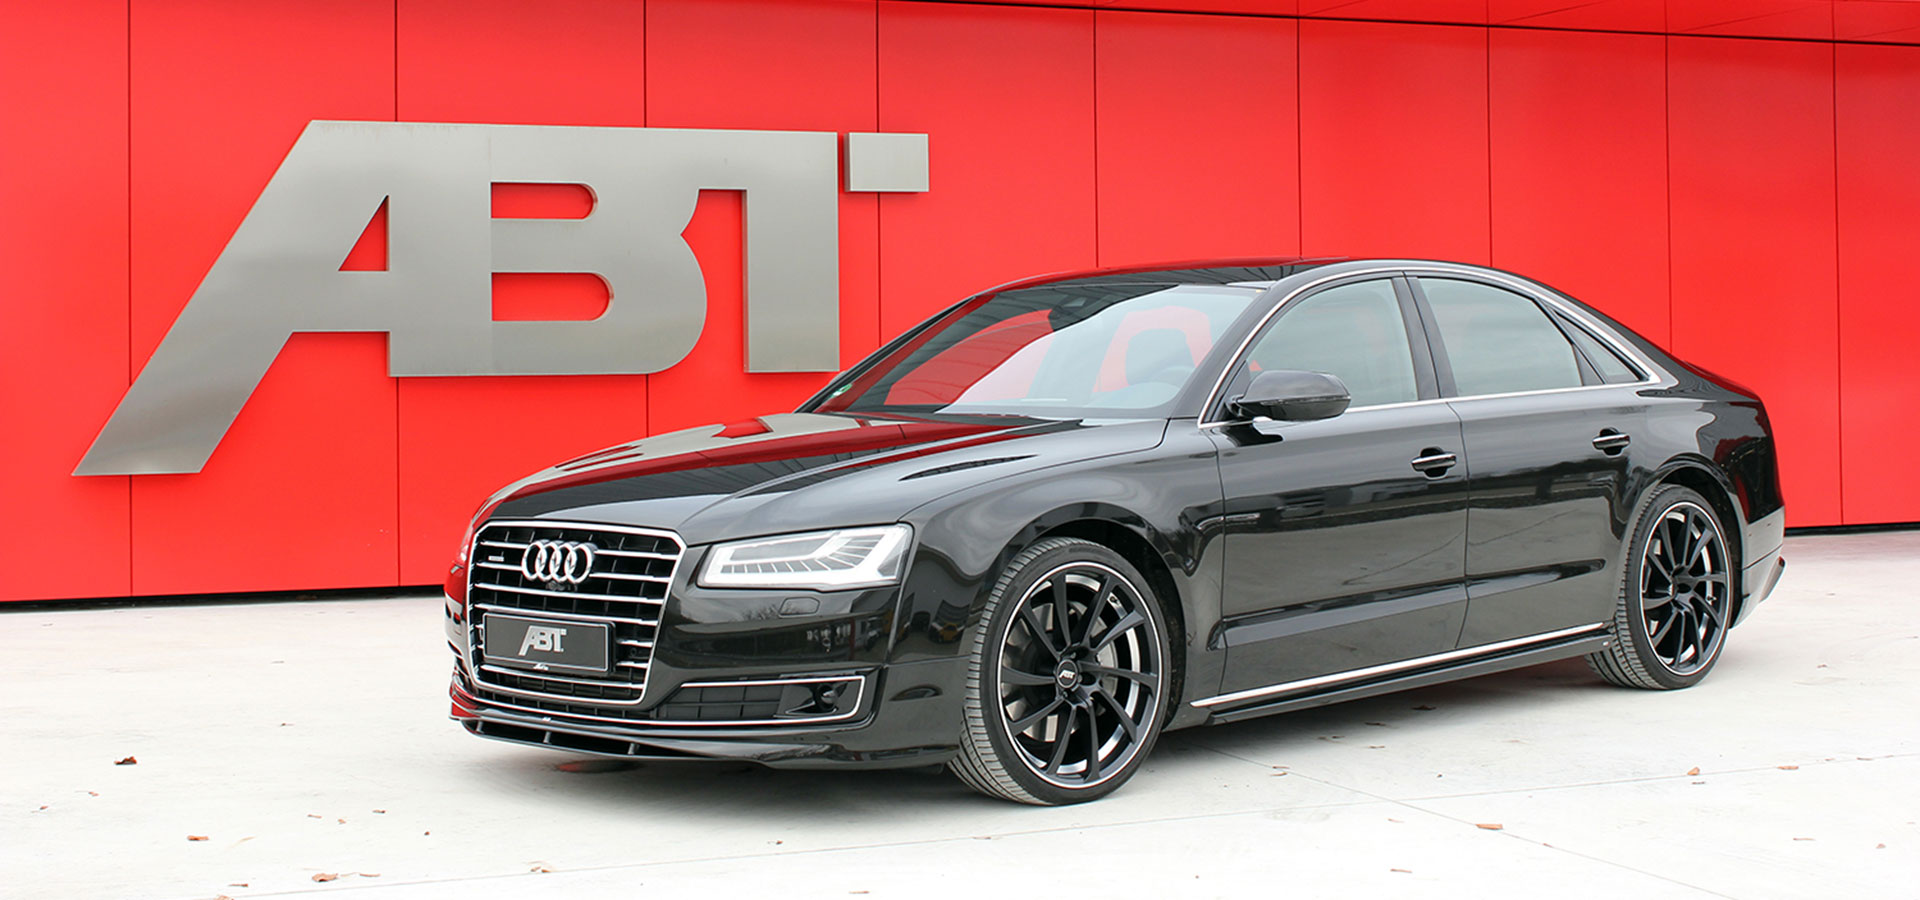 Audi A8 Abt Sportsline